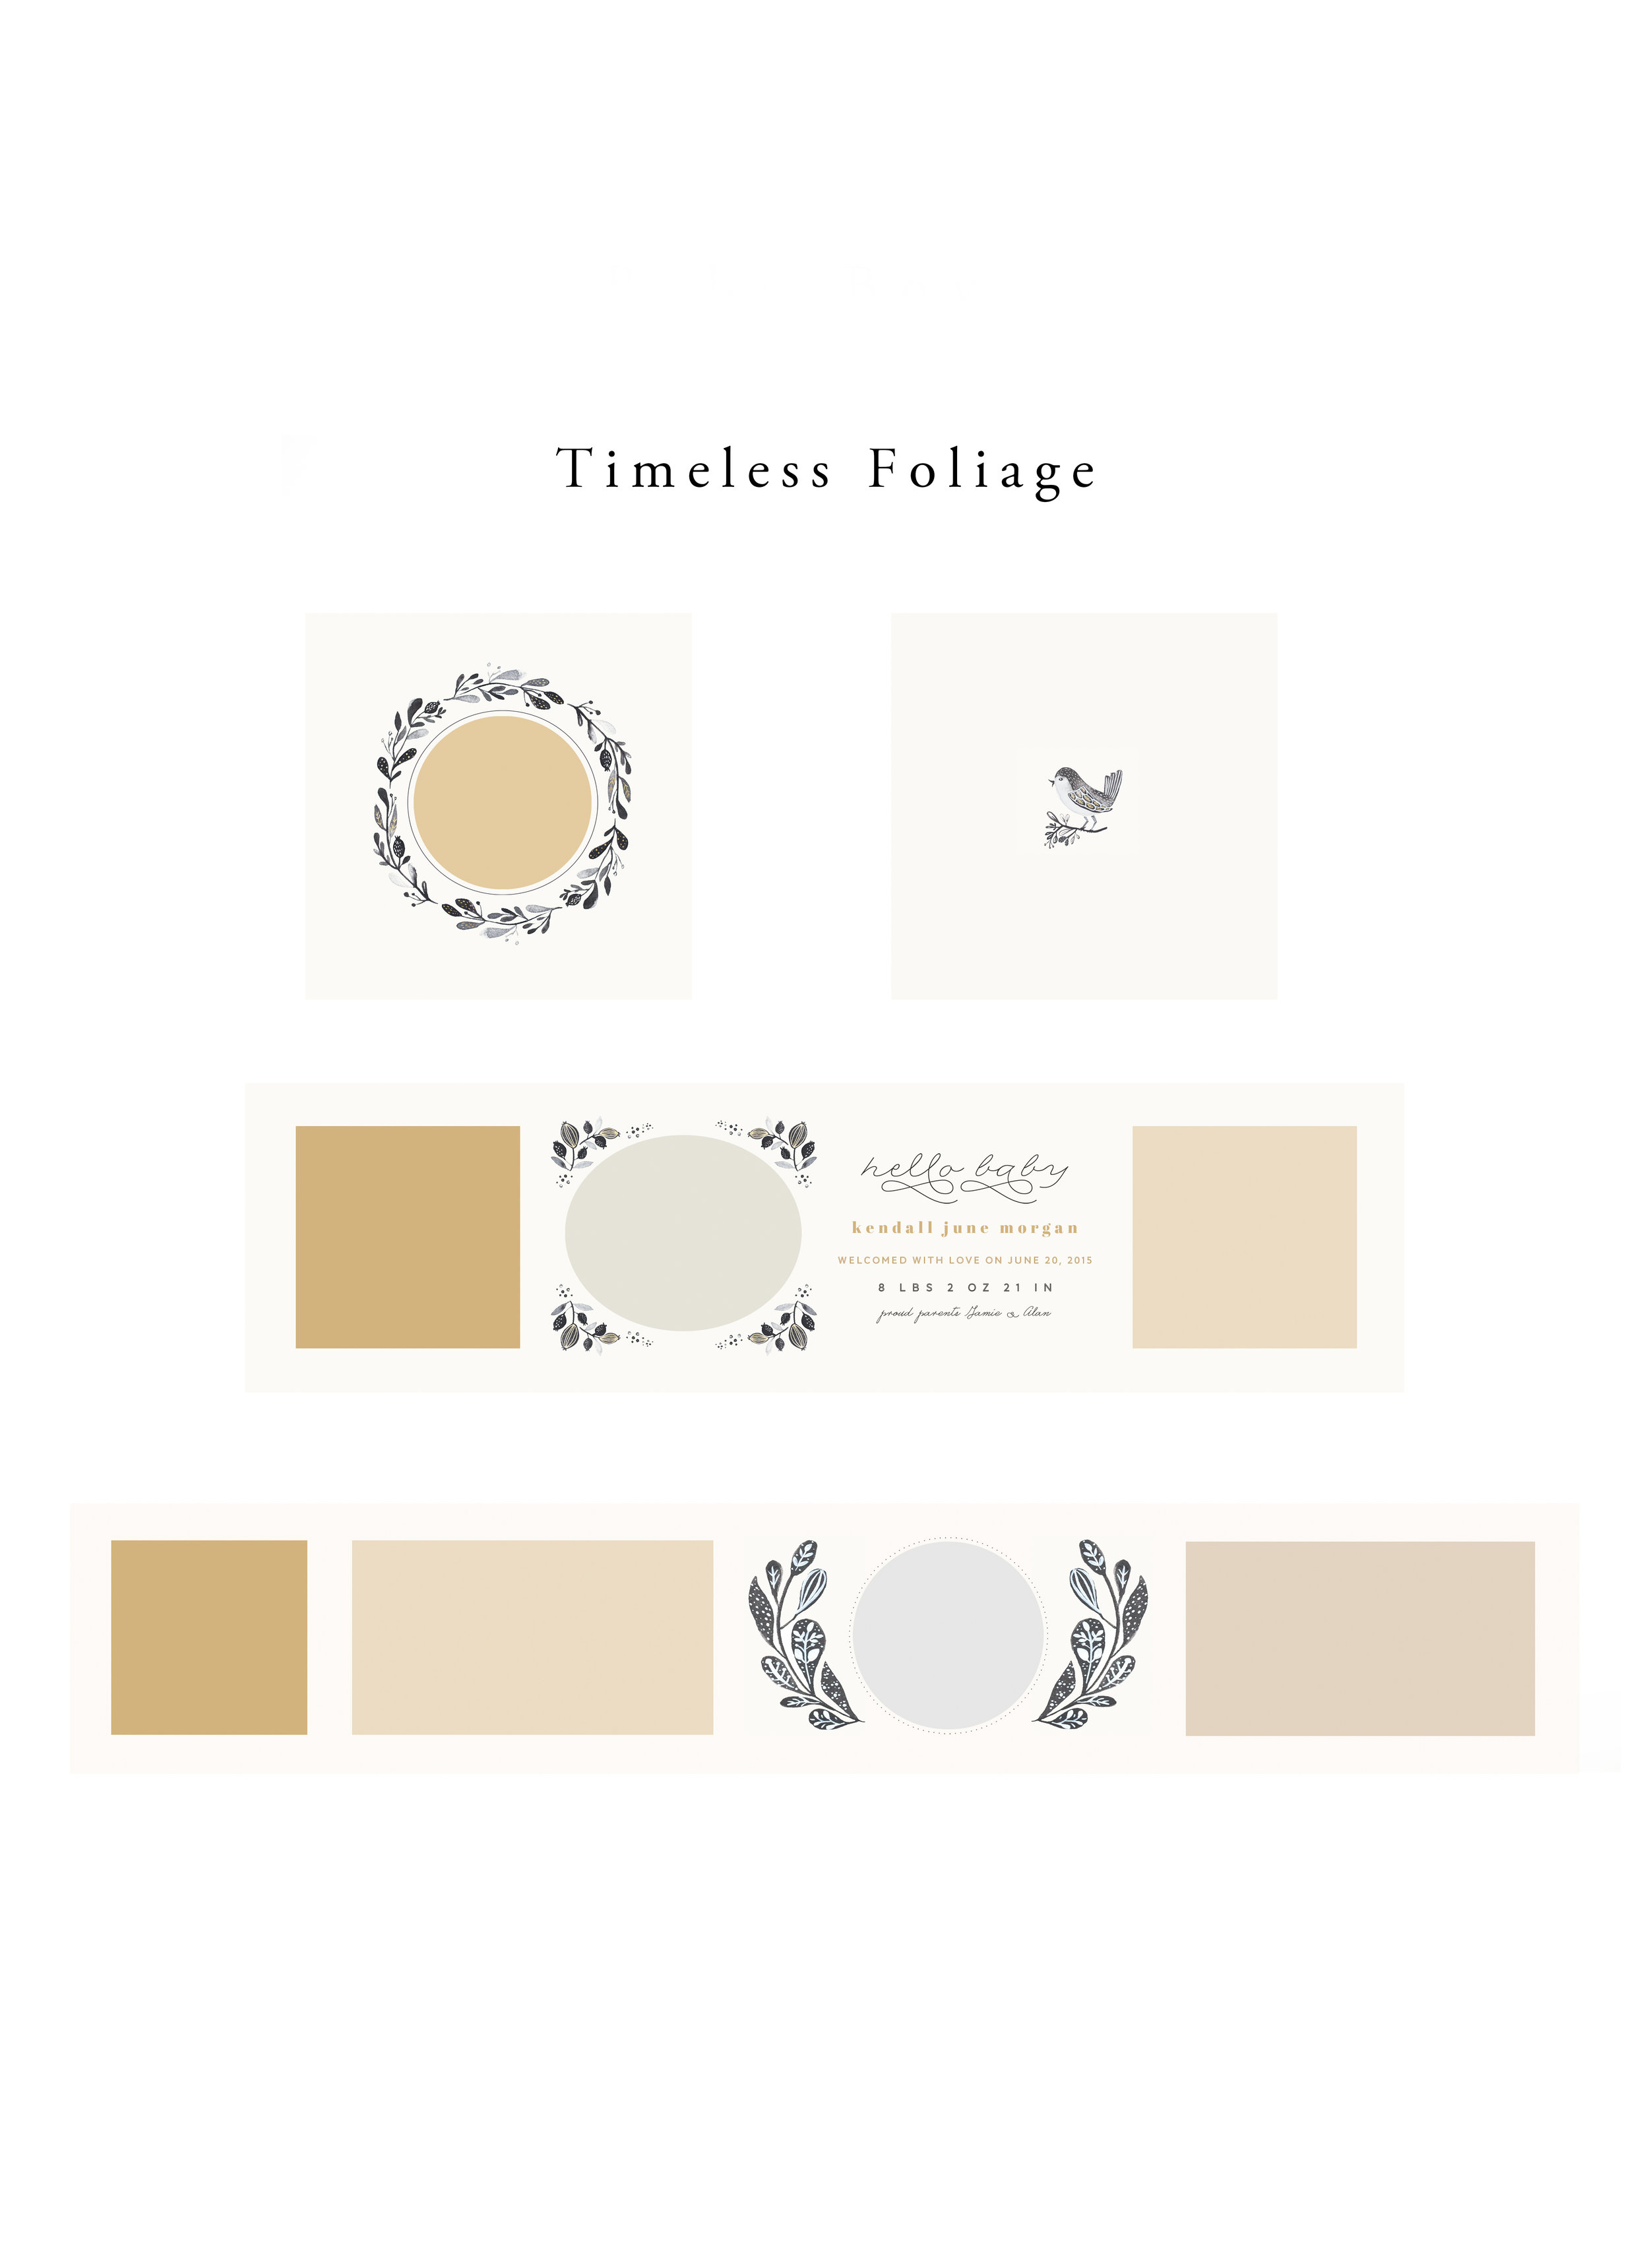 TimelessFoliage.jpg